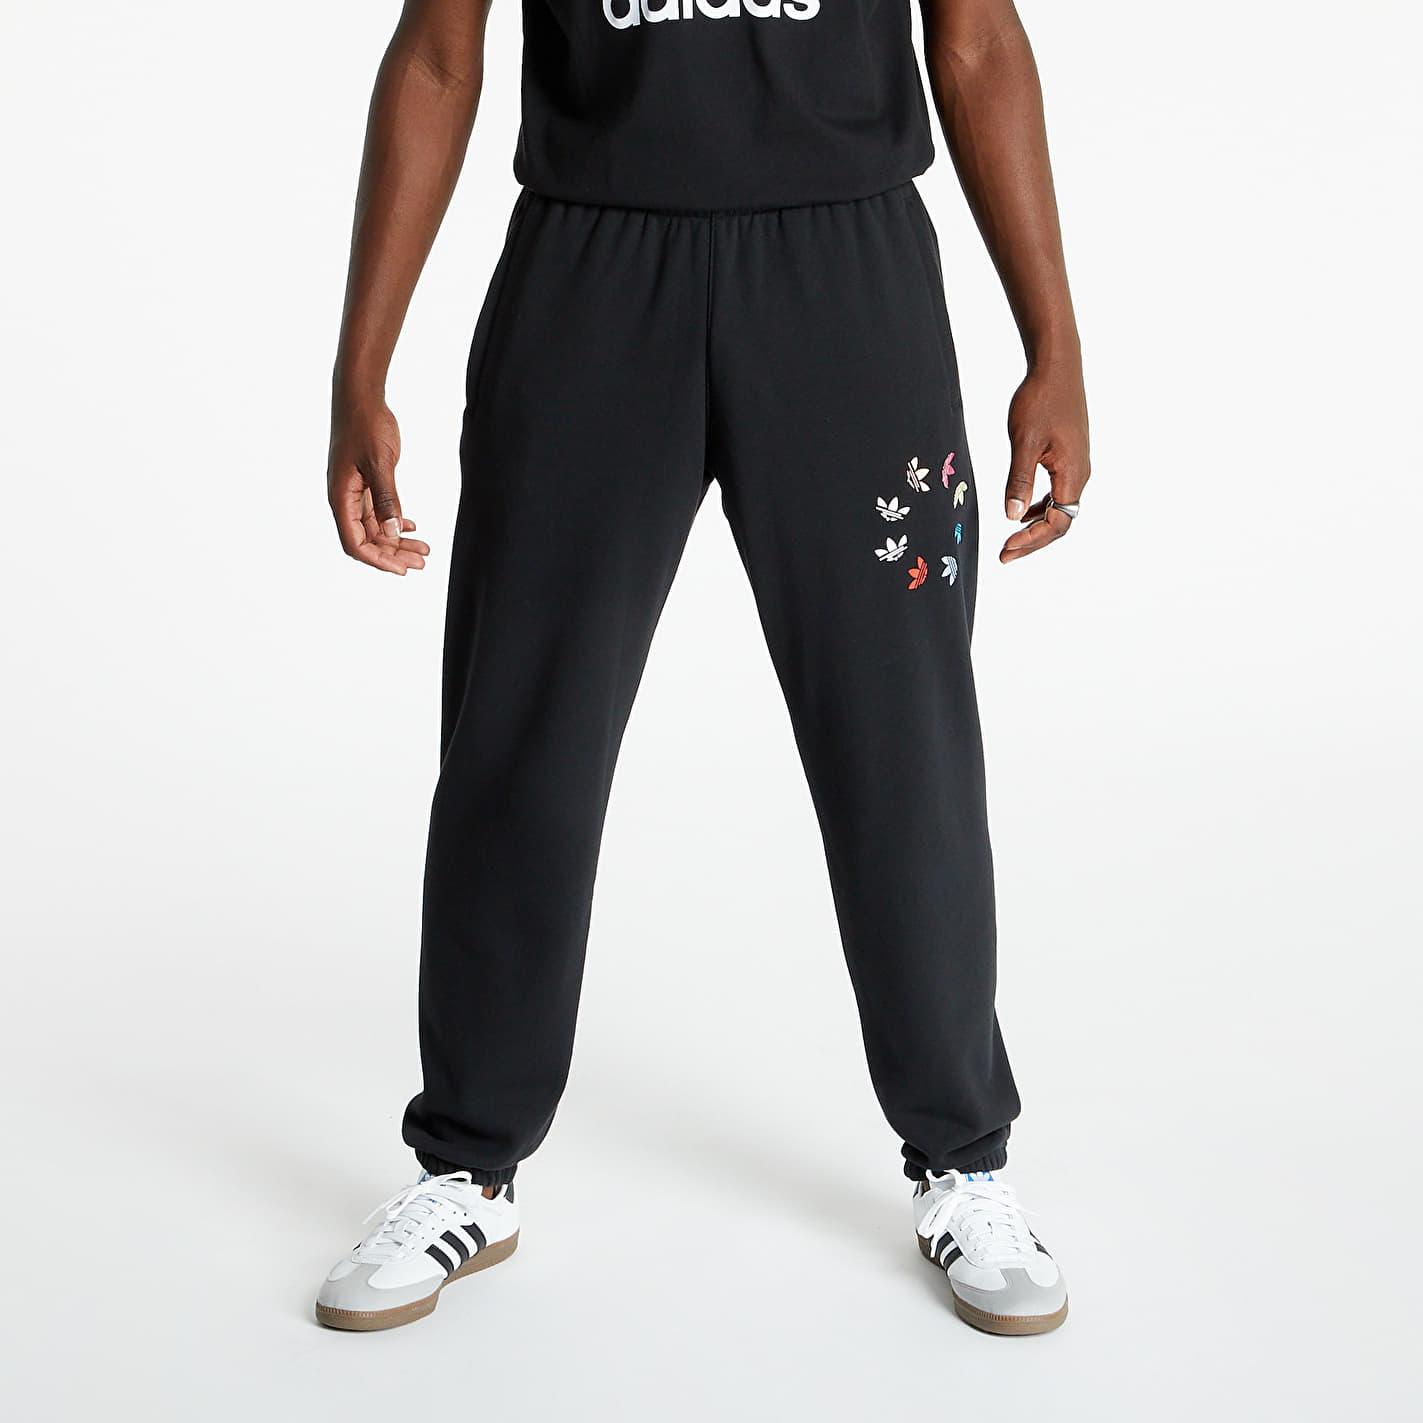 adidas St Sweat Pants Black/ Multicolor S